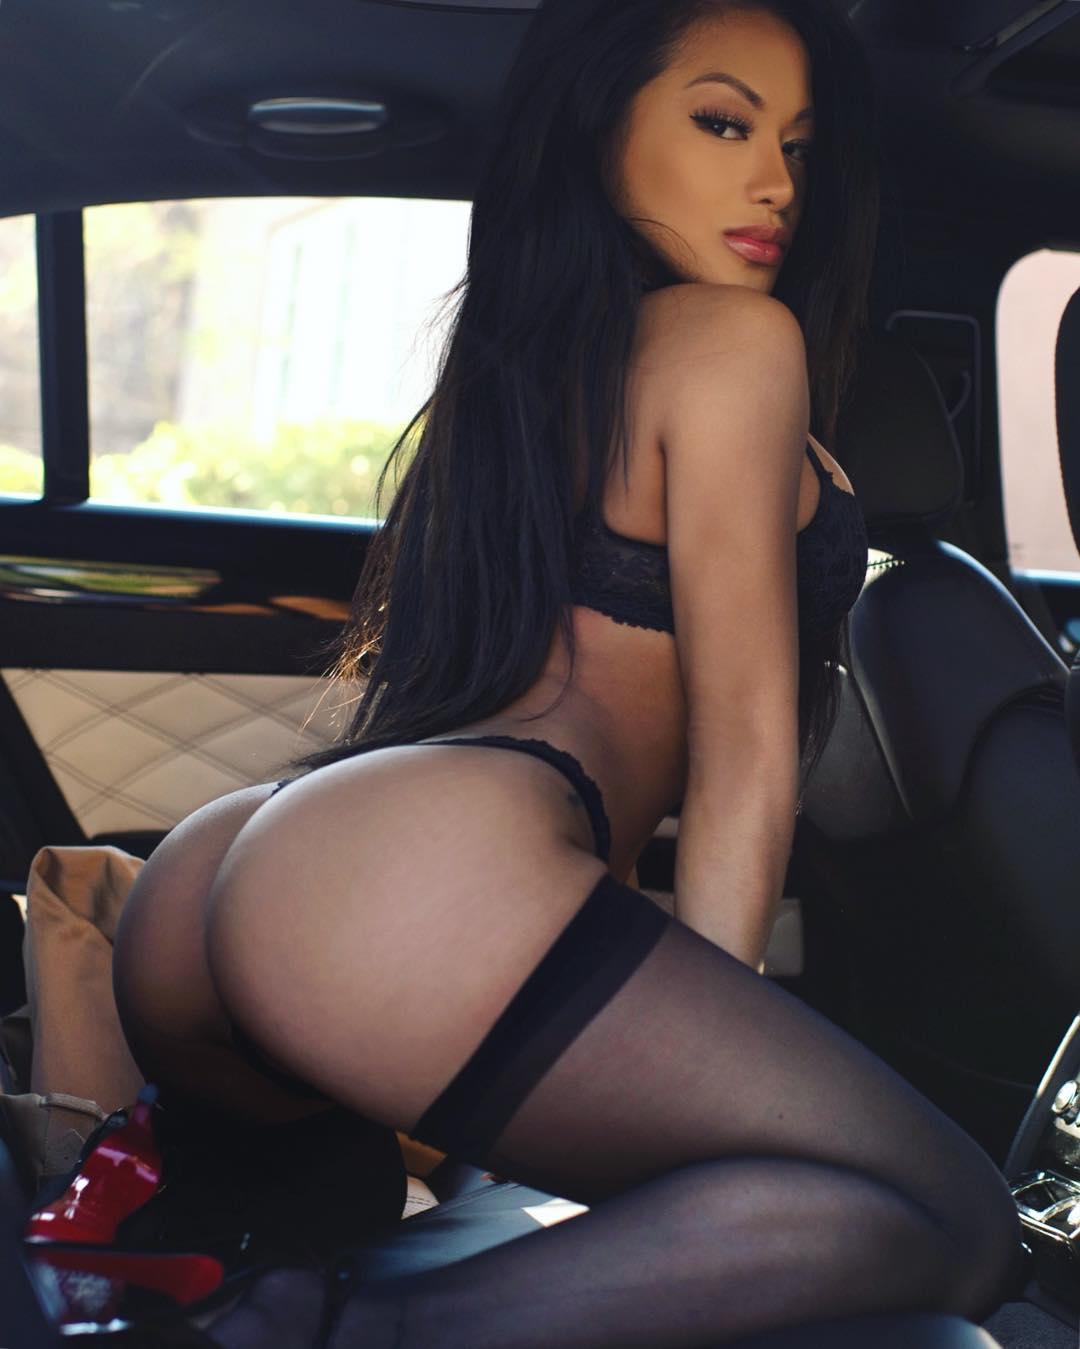 Filipina-nude-model-CJ-Miles-www.ohfree.net-048 Sexy Filipina hottest nude girl CJ Miles naked photos leaked